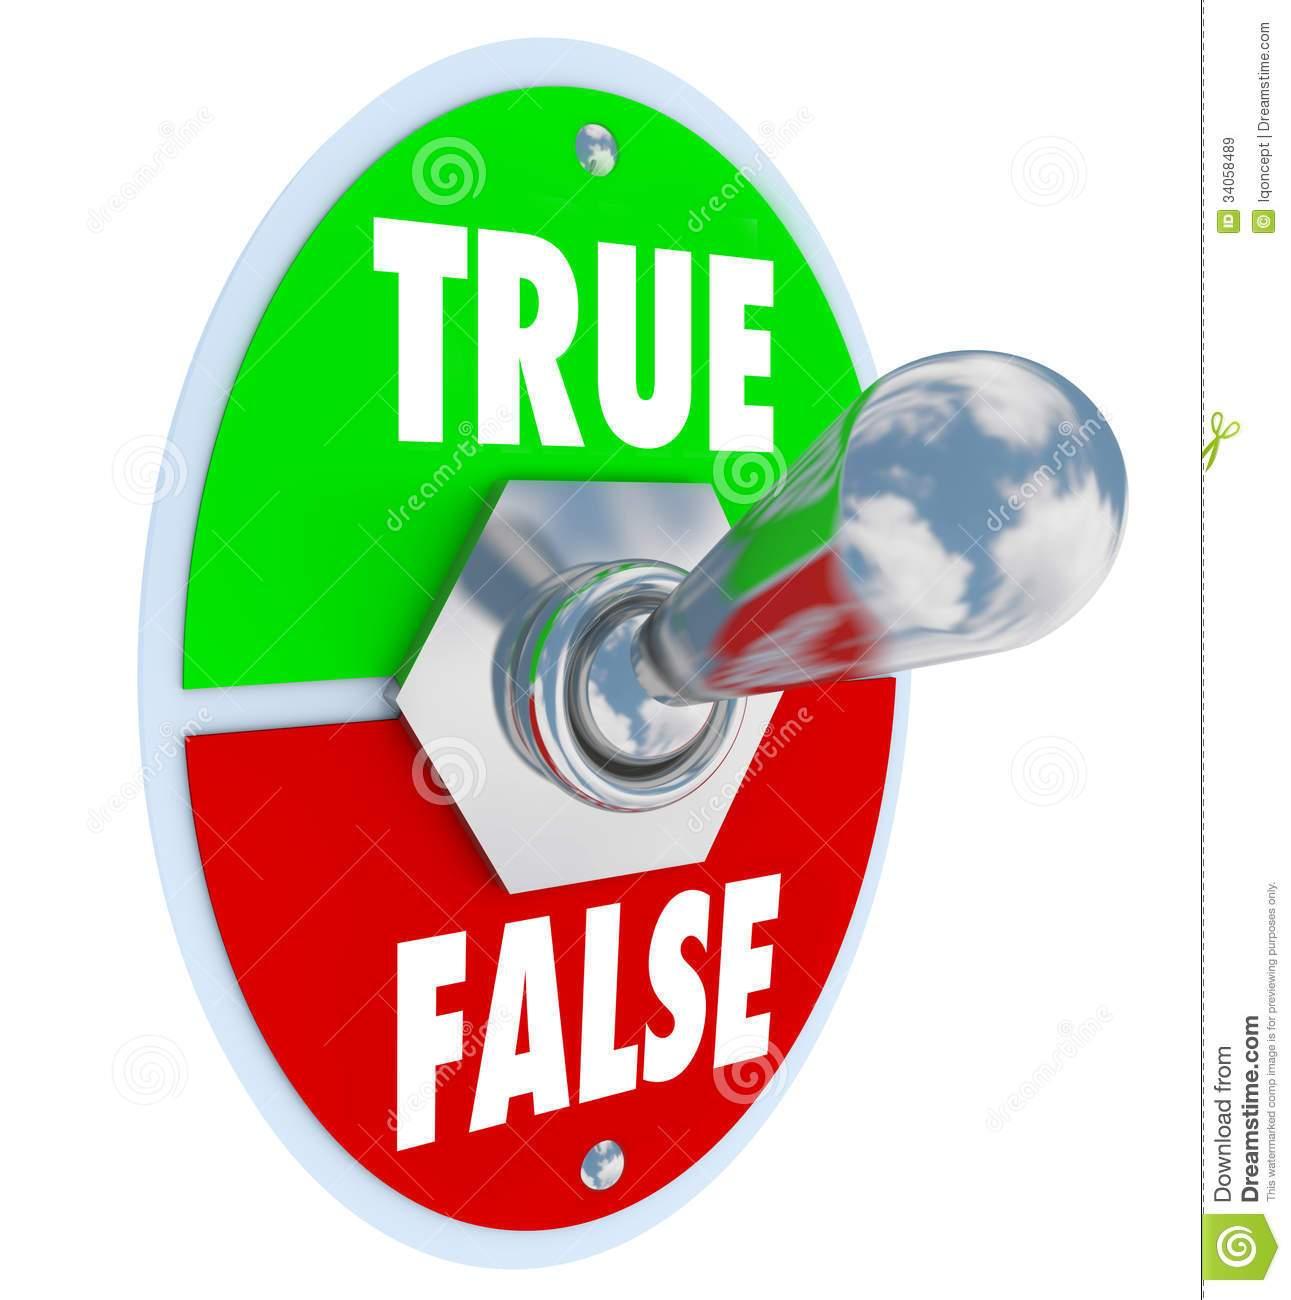 True false clipart 9 » Clipart Portal image library download